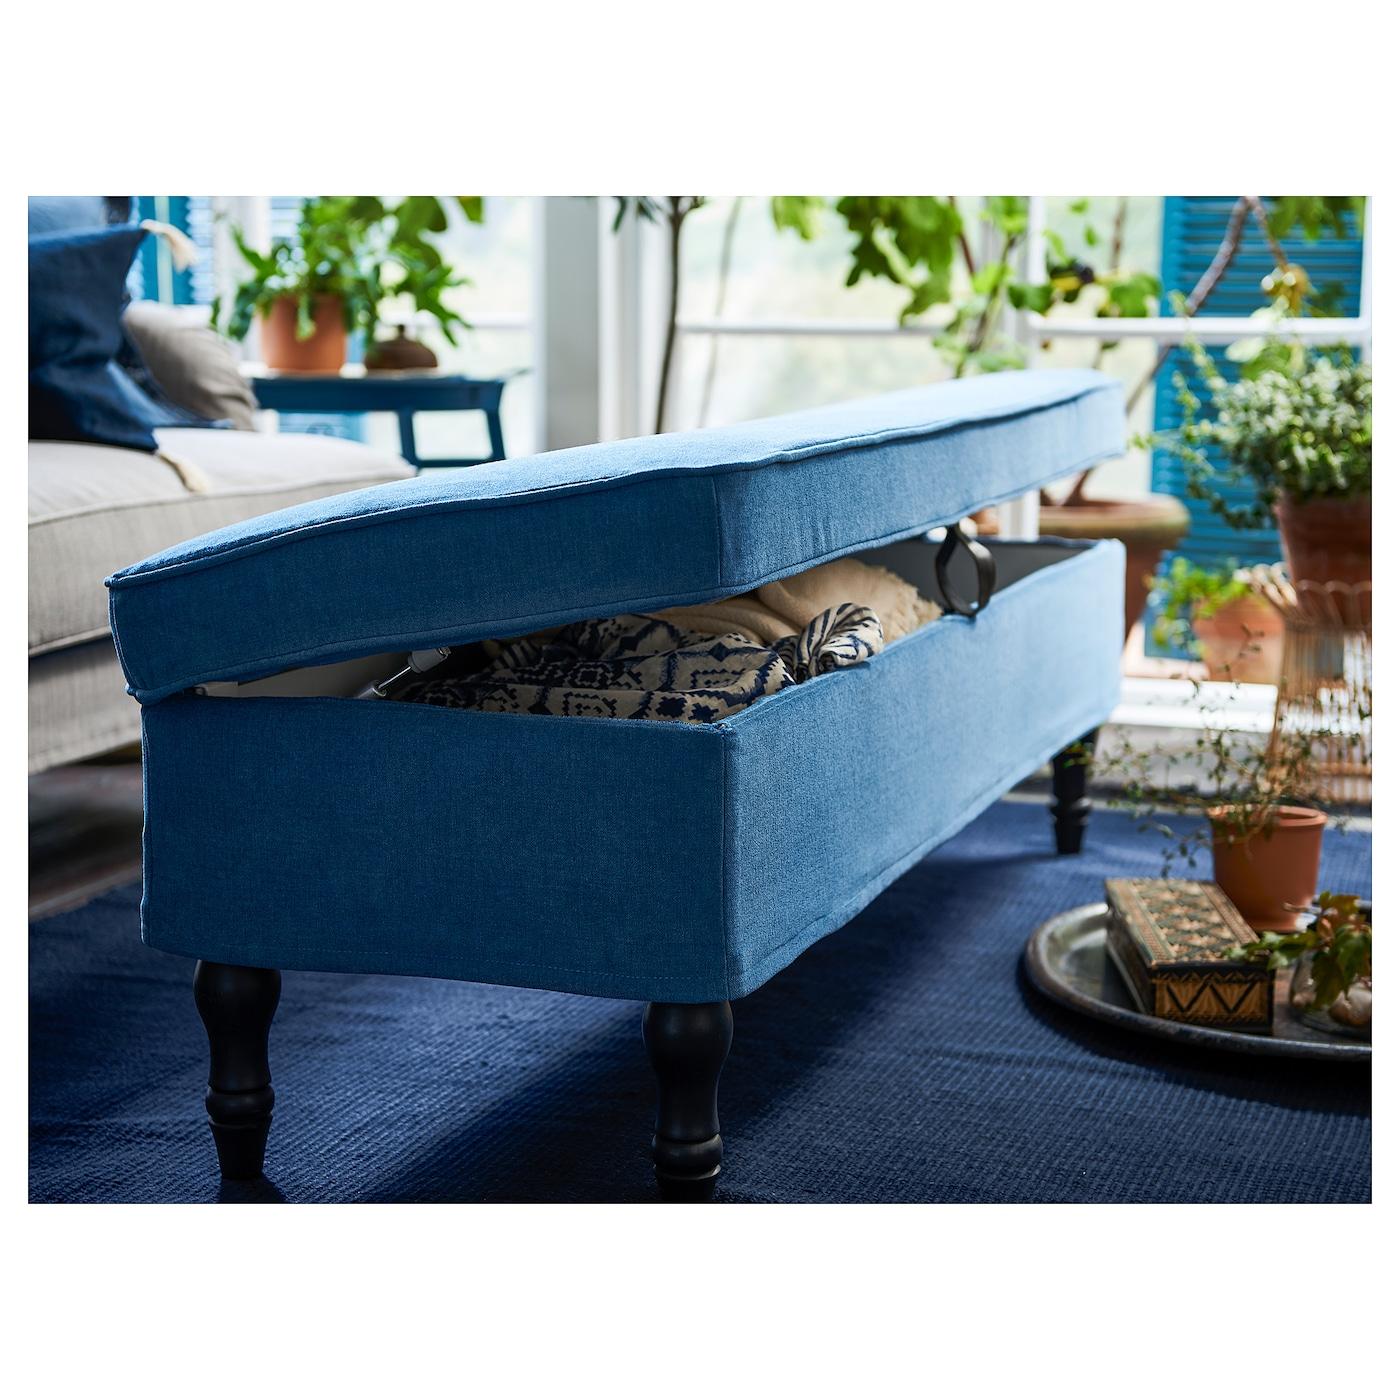 Stocksund Banquette Ljungen Bleu Noir Bois Ikea